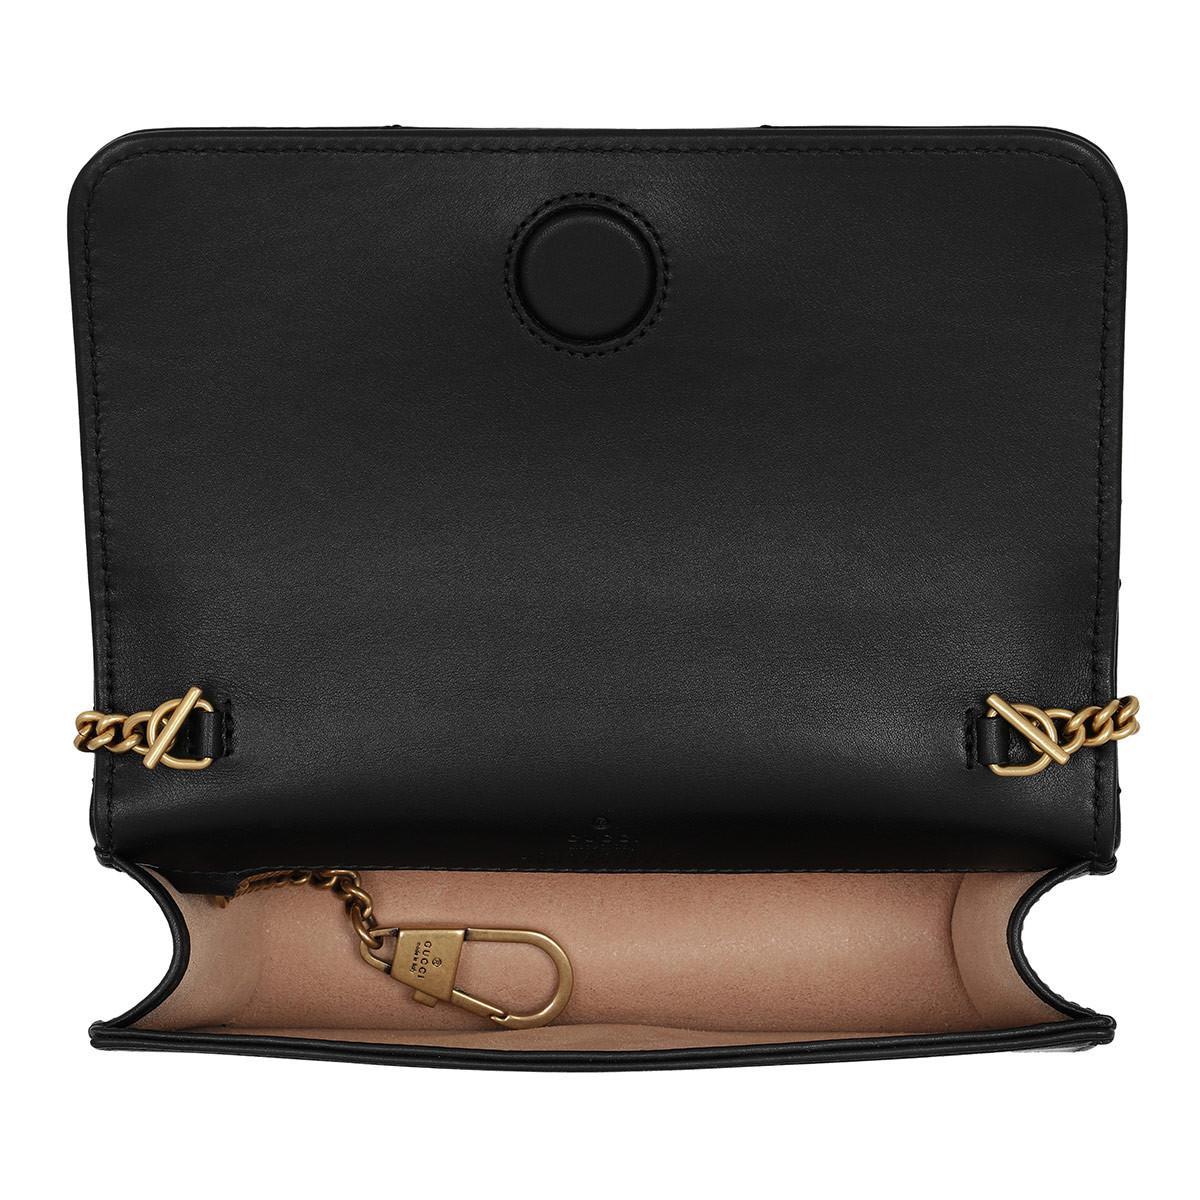 67bec4eb55 Gucci Gg Marmont Shoulder Bag 2.0 Nero in Black - Lyst